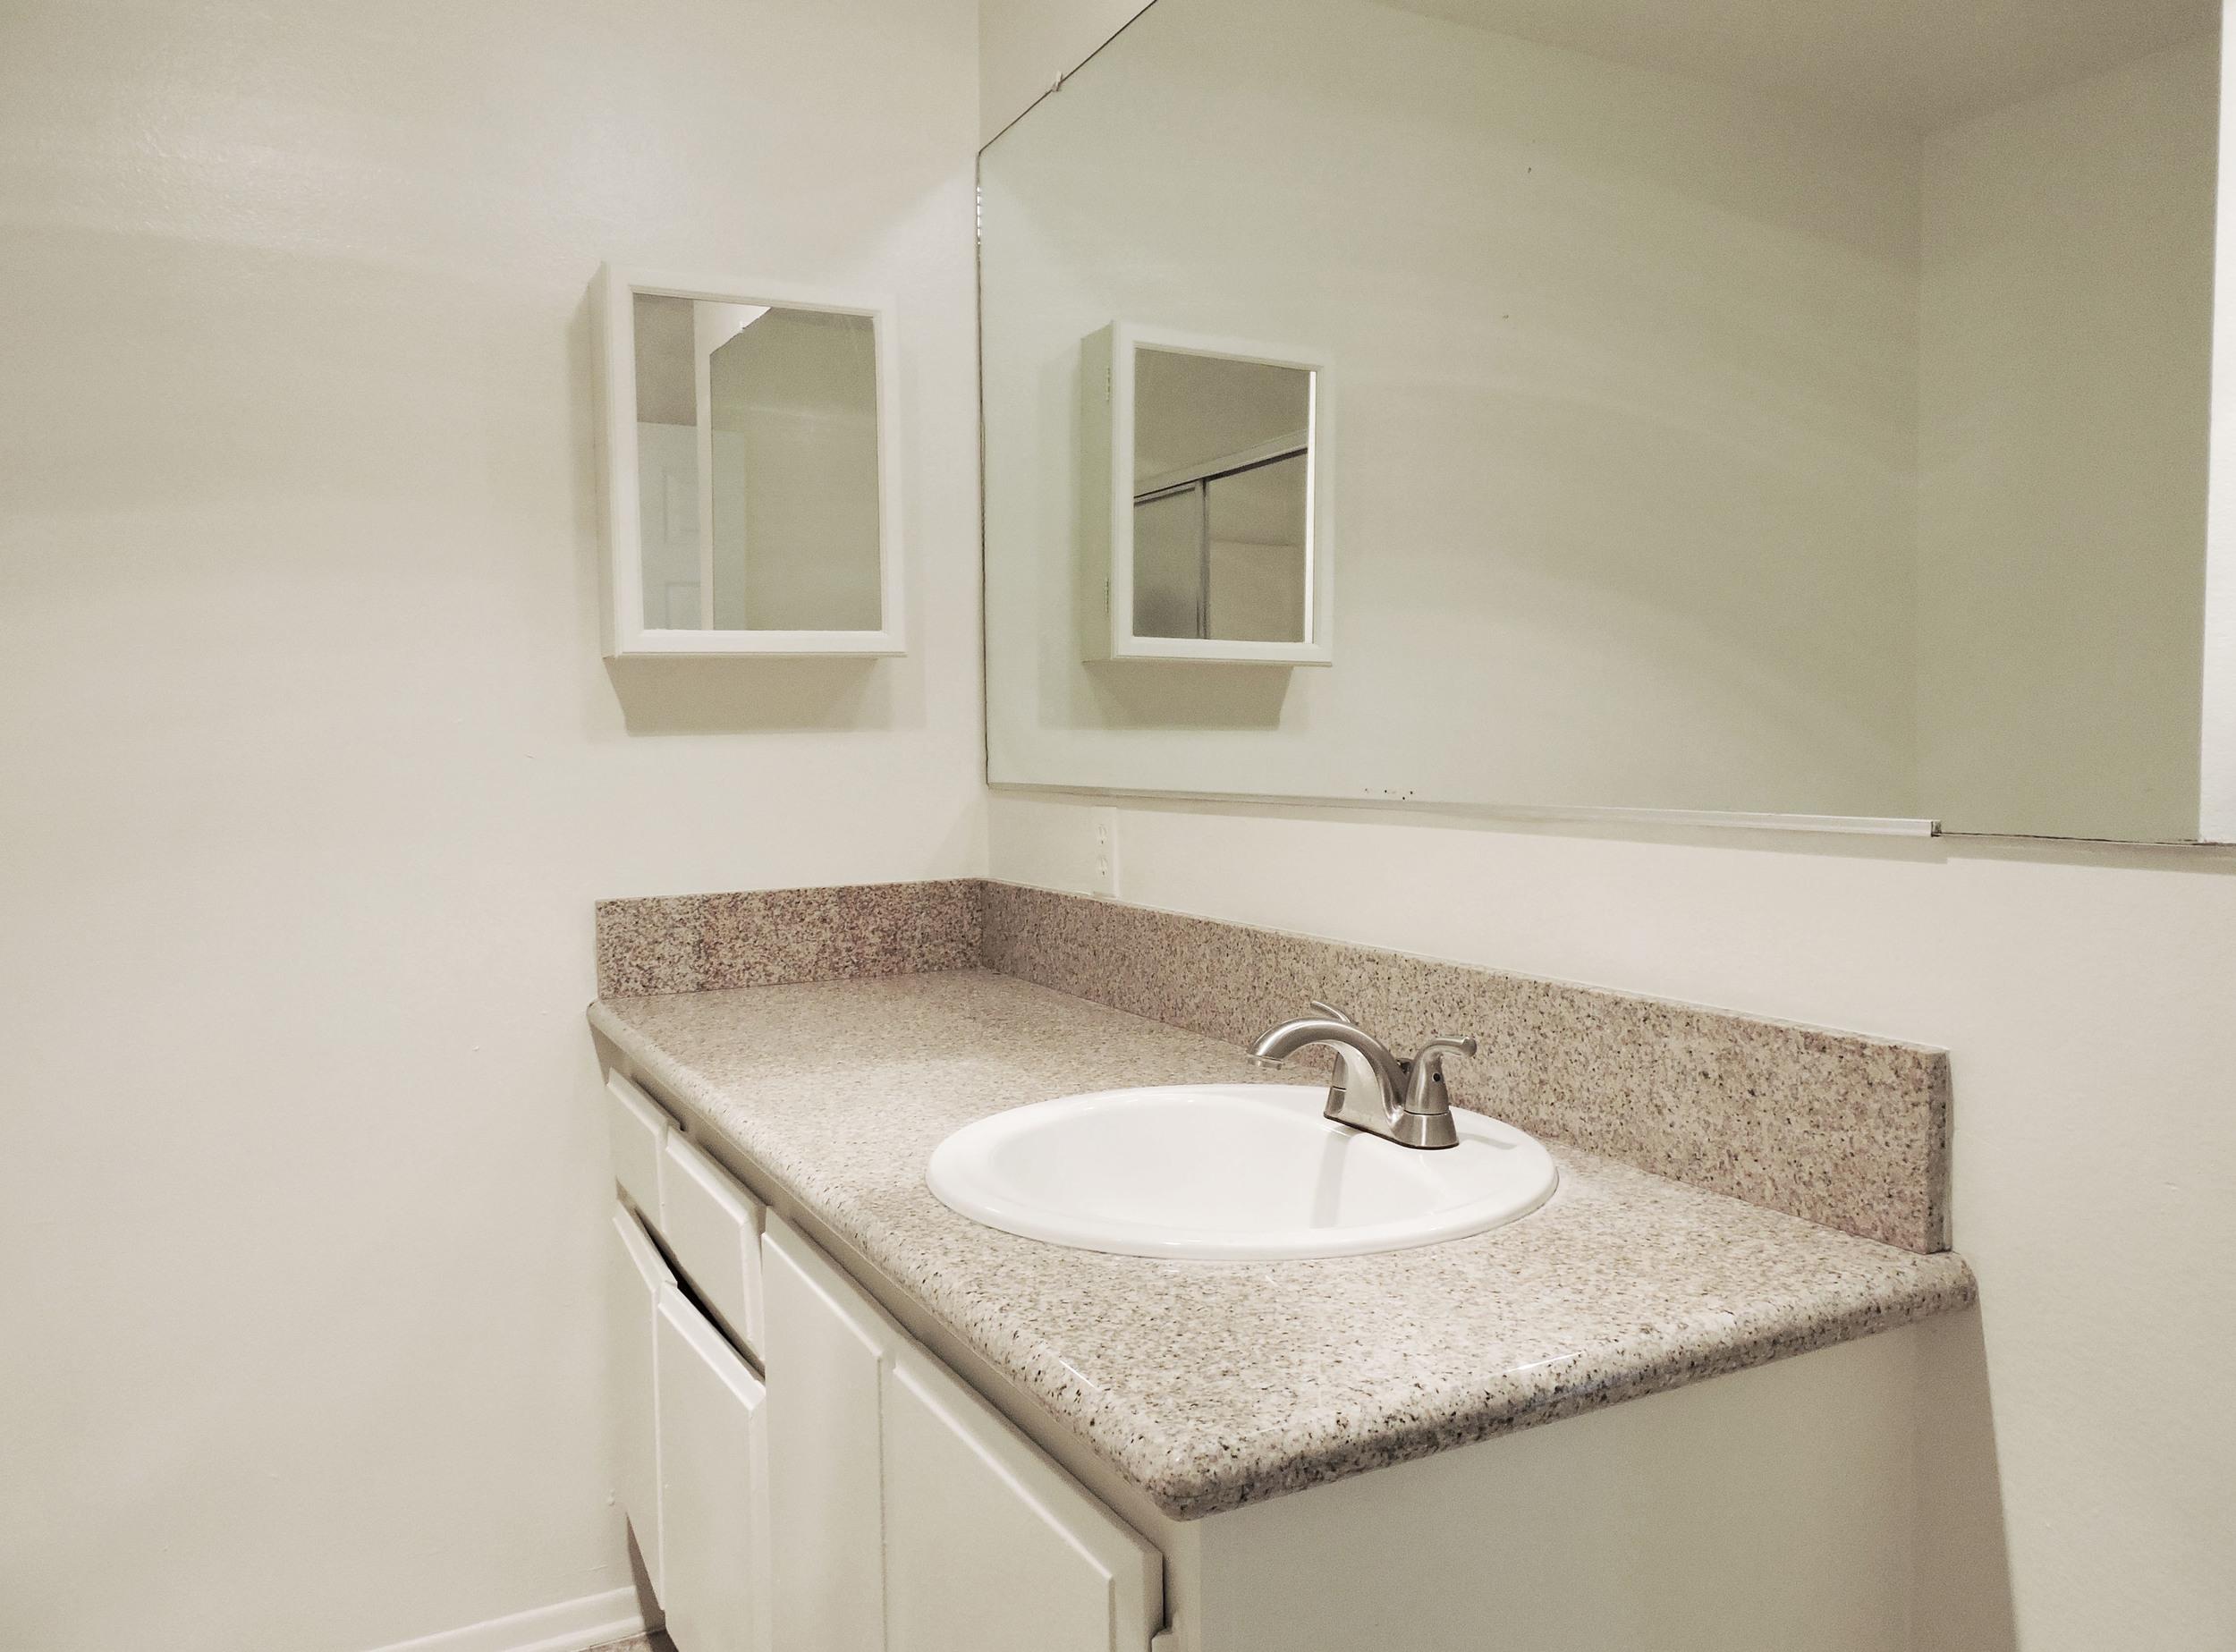 233 bathroom.jpg